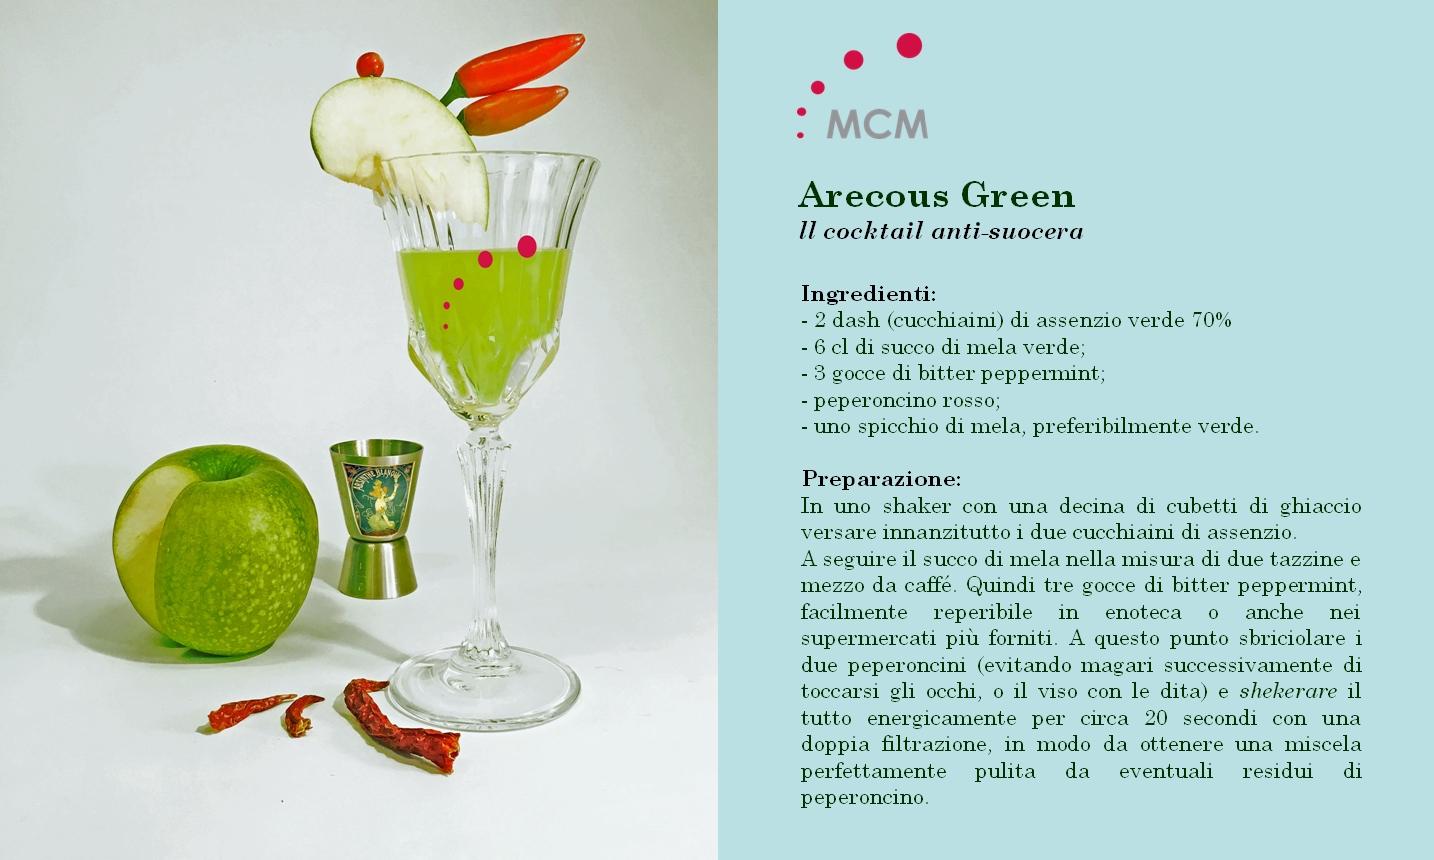 arecous-green-mcm-cocktail-anti-suocera-ricetta